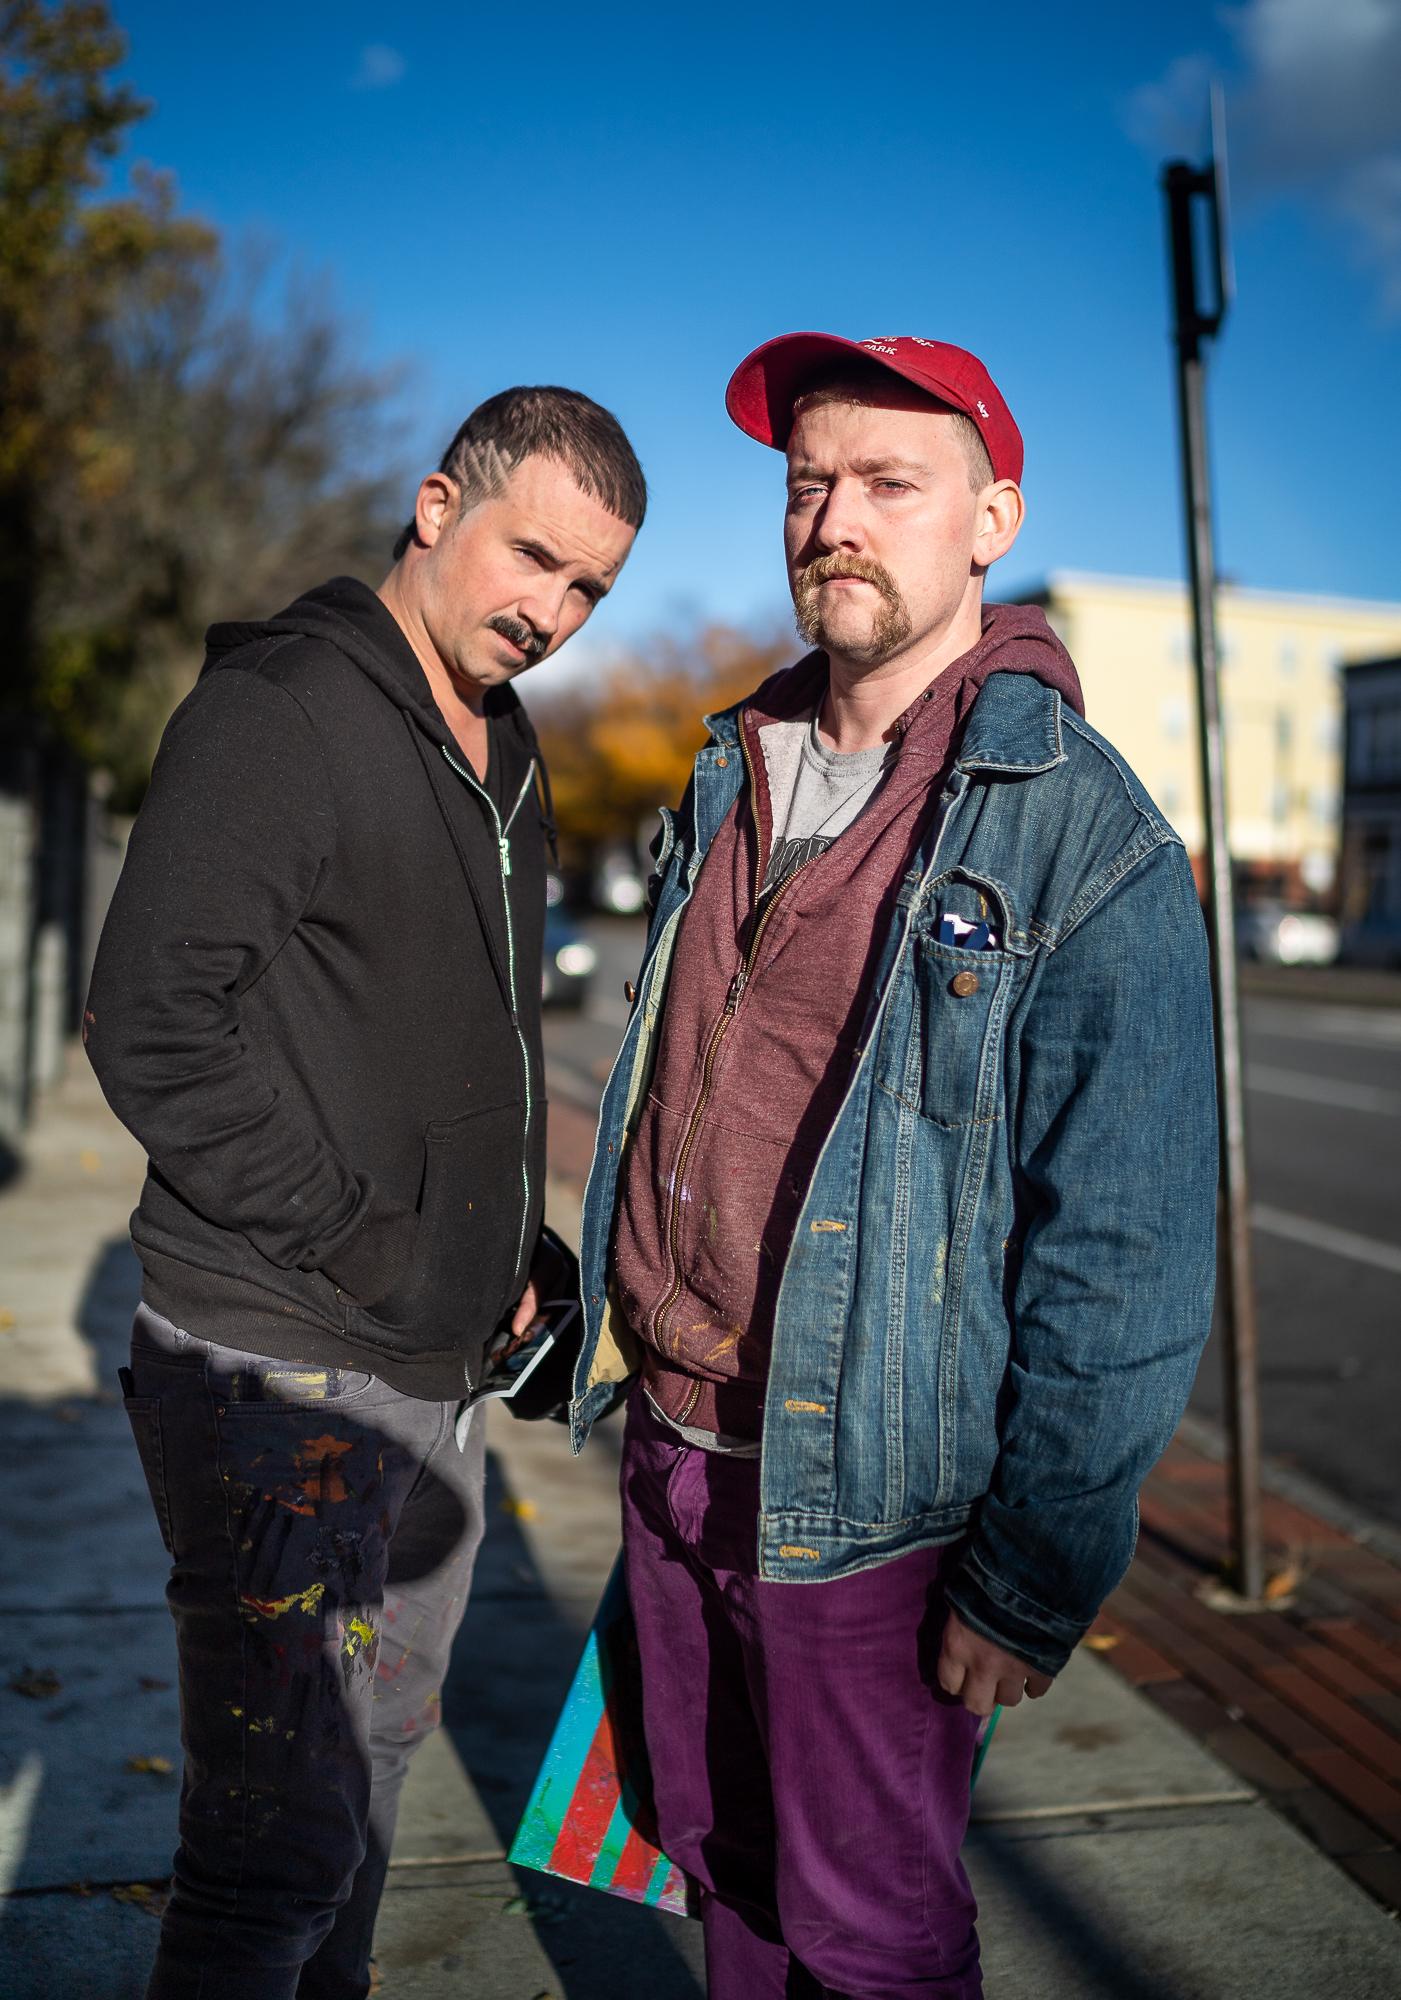 Matt and John, Local Artists, Shrewsbury Street, November, 2018.